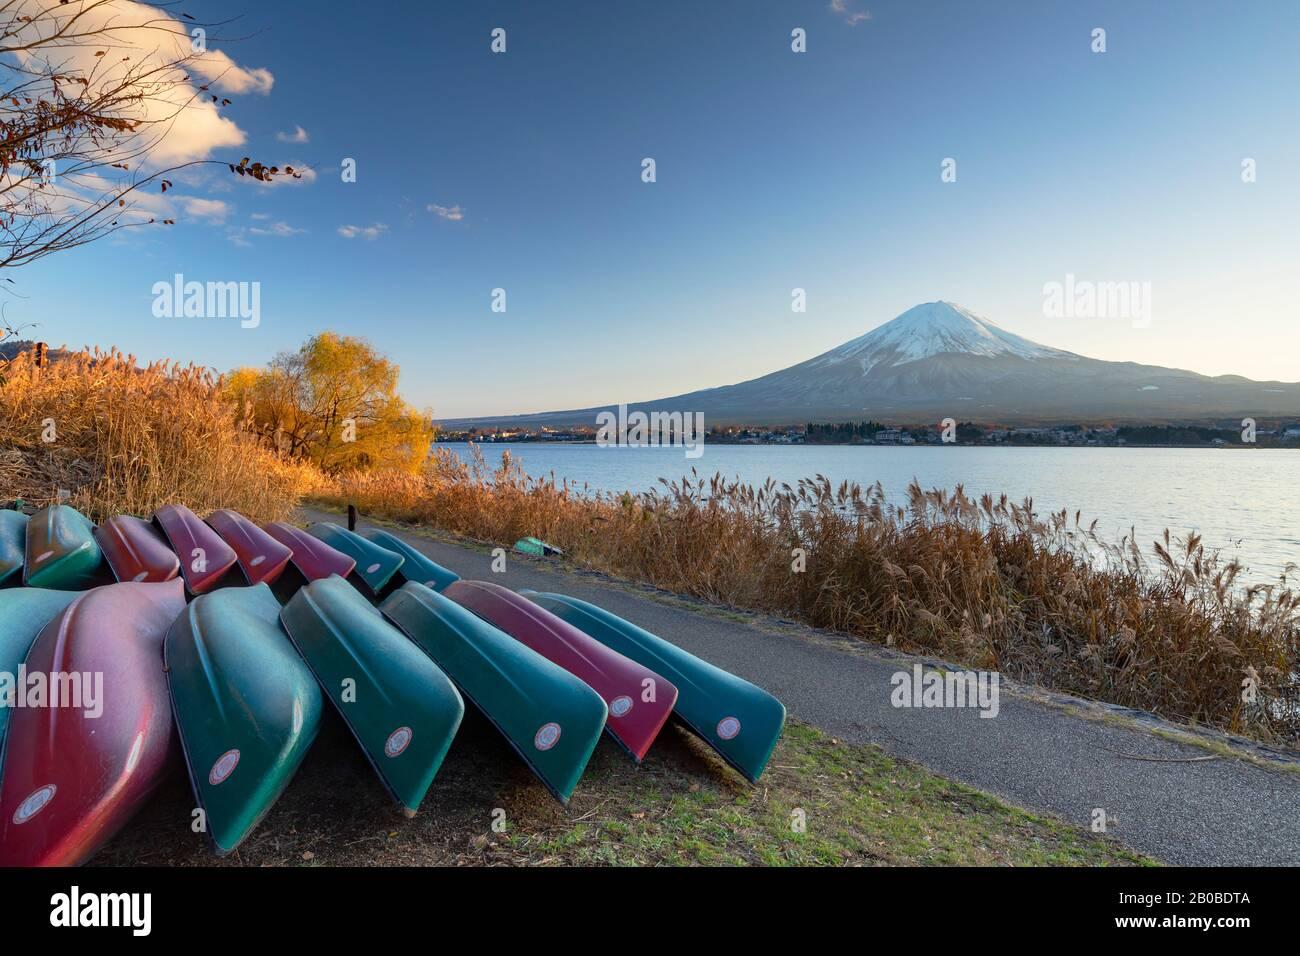 Mount Fuji and Lake Kawaguchi, Yamanashi Prefecture, Japan Stock Photo